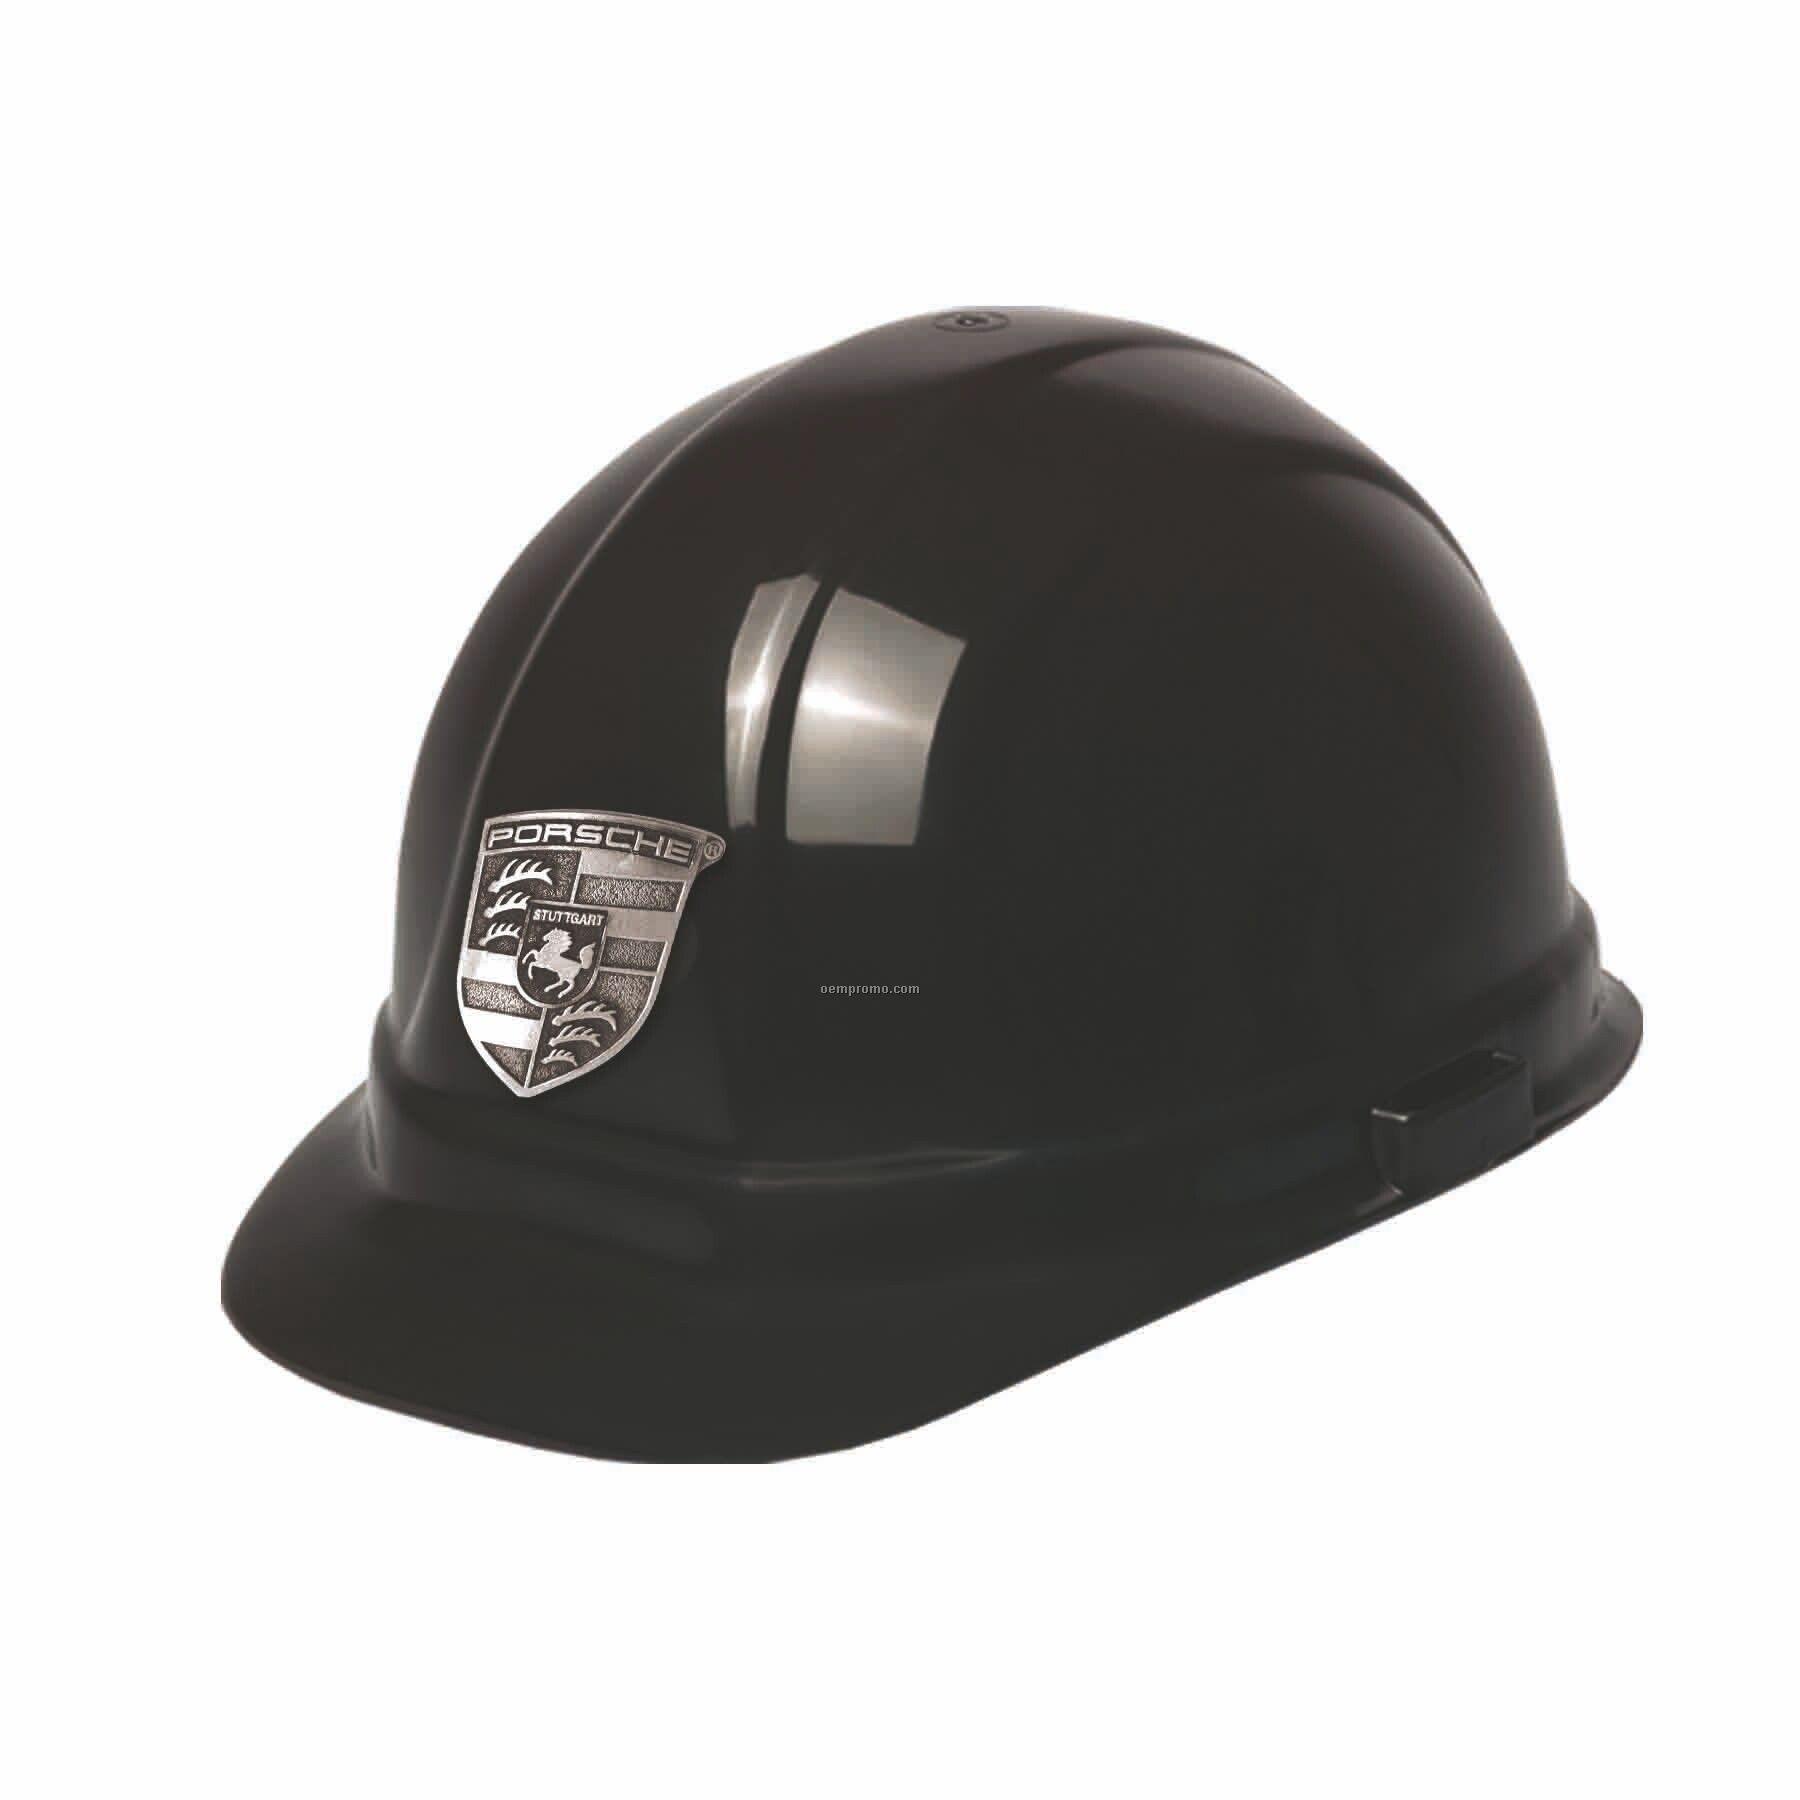 Hard Hat W/ Decoration Pewter Emblem/Decal